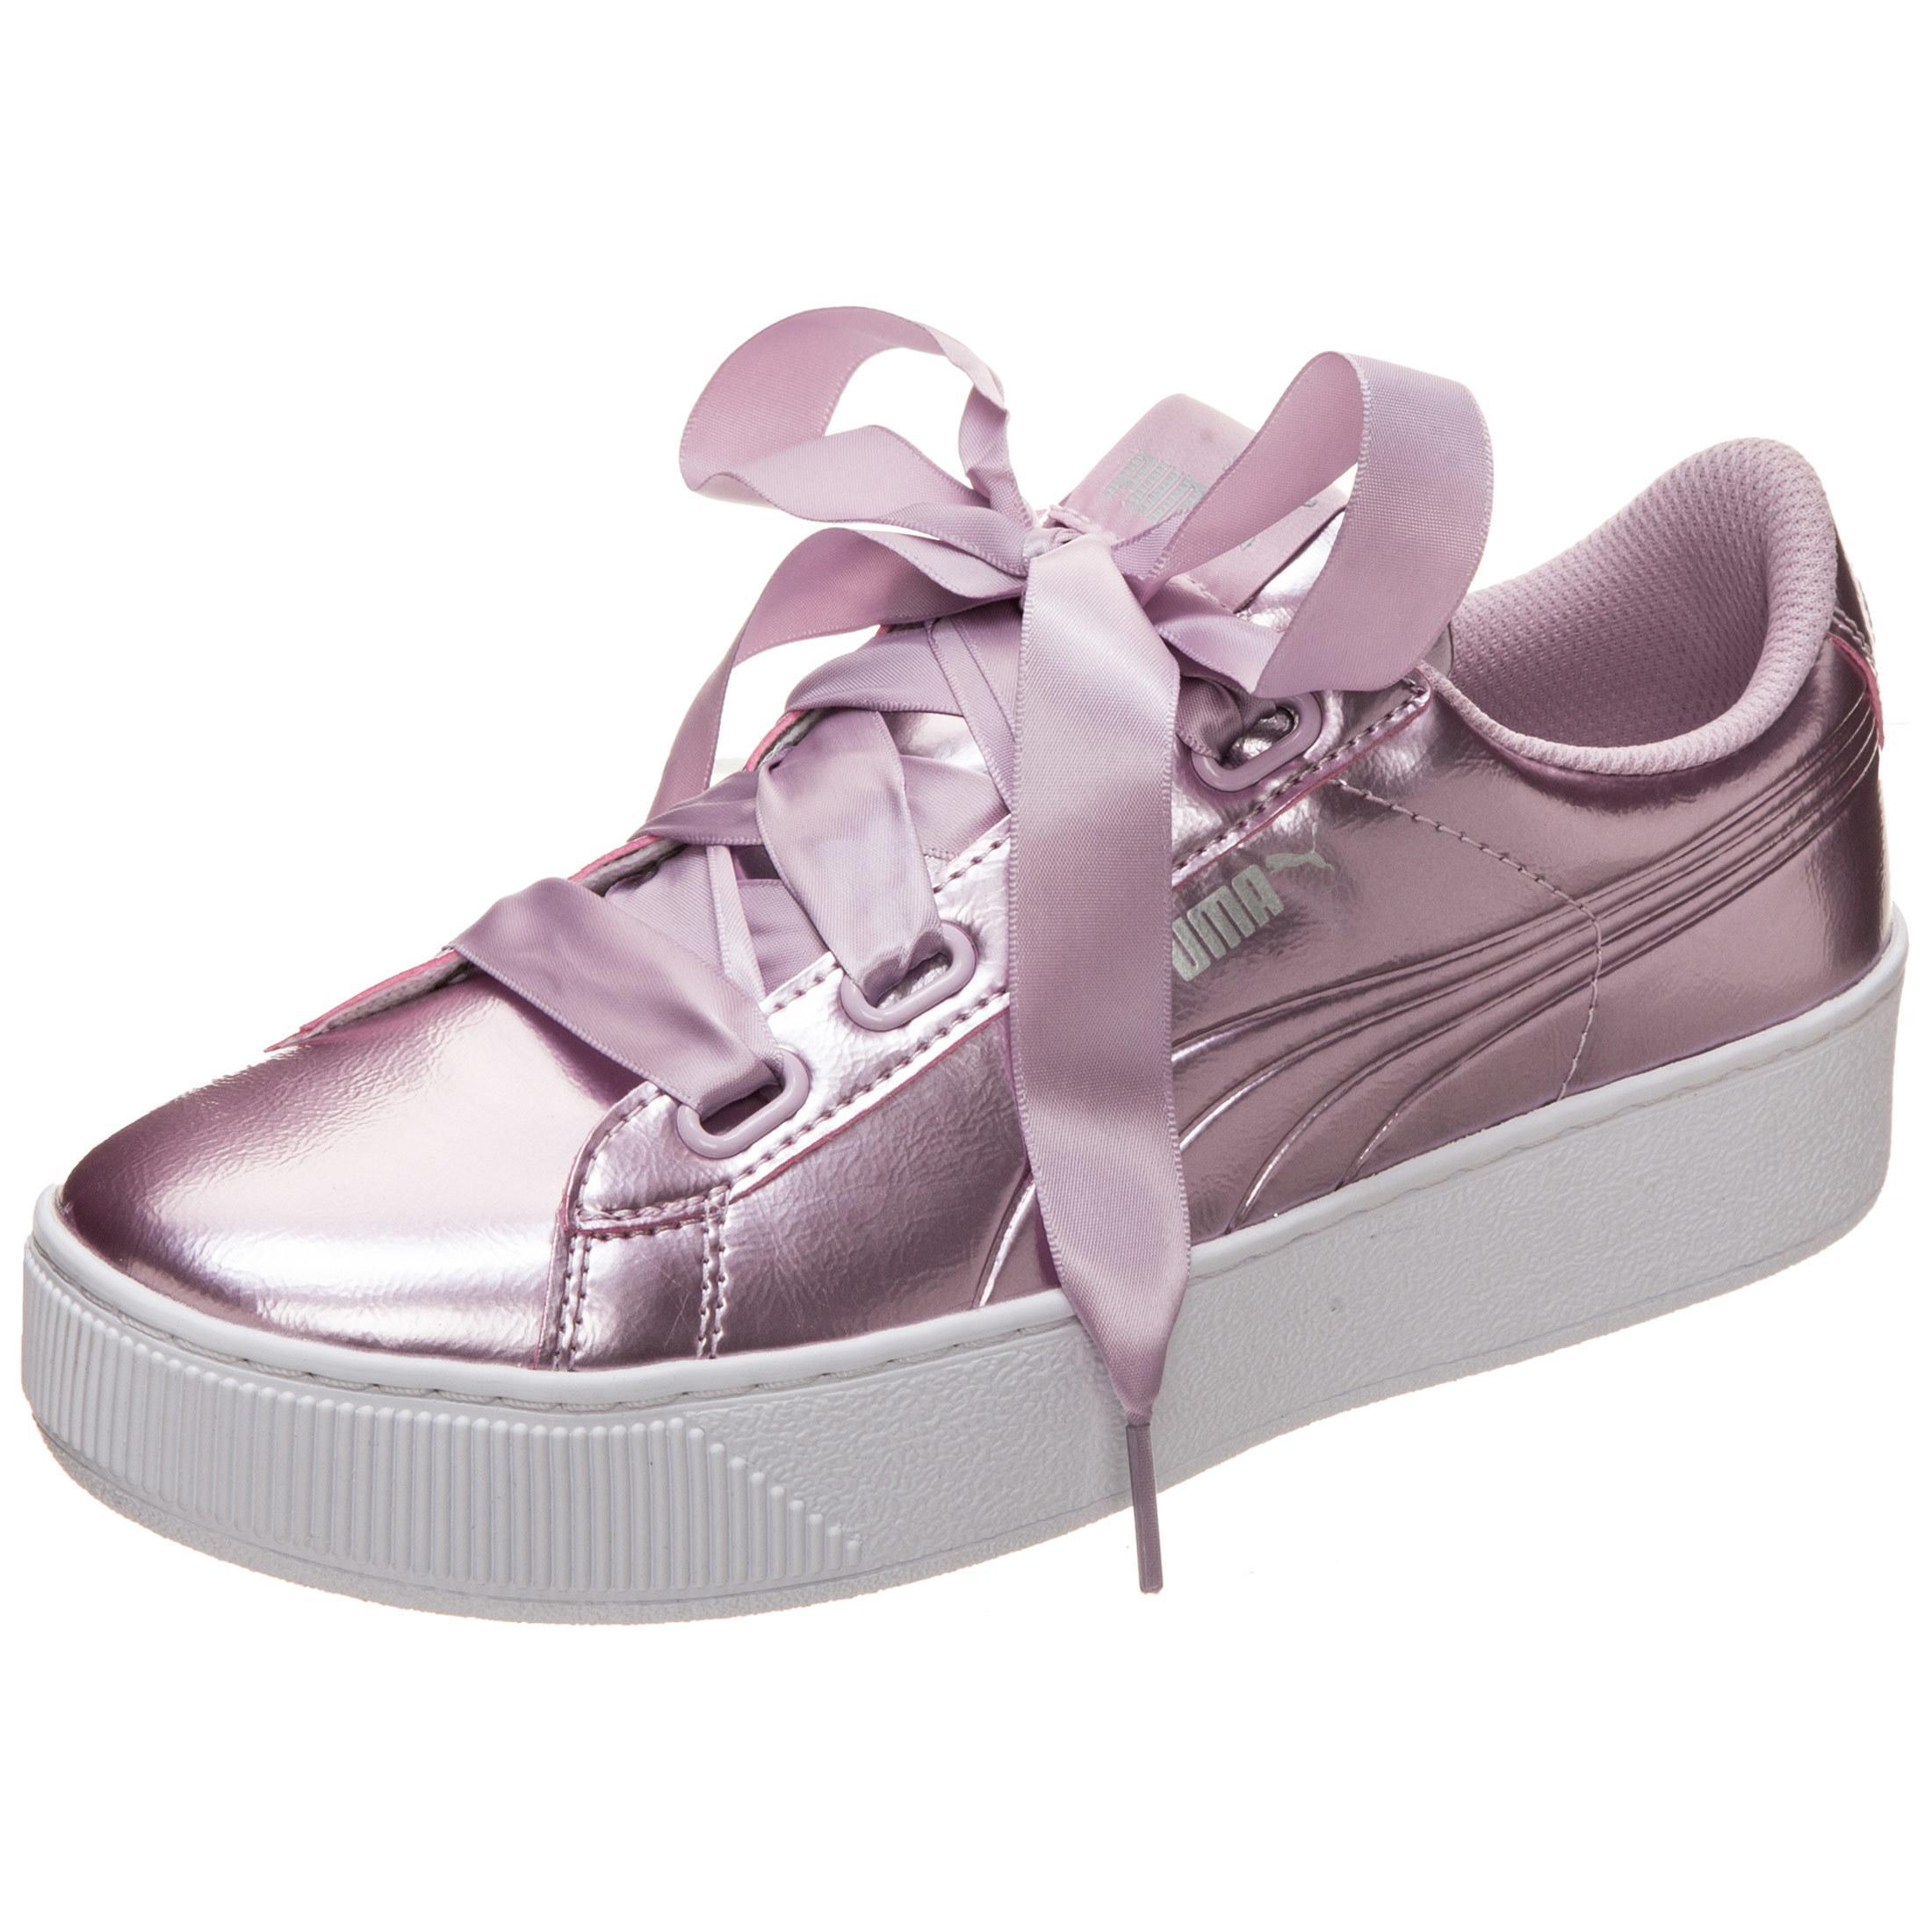 Vikky Puma Sneakers – NikeSaleOnline